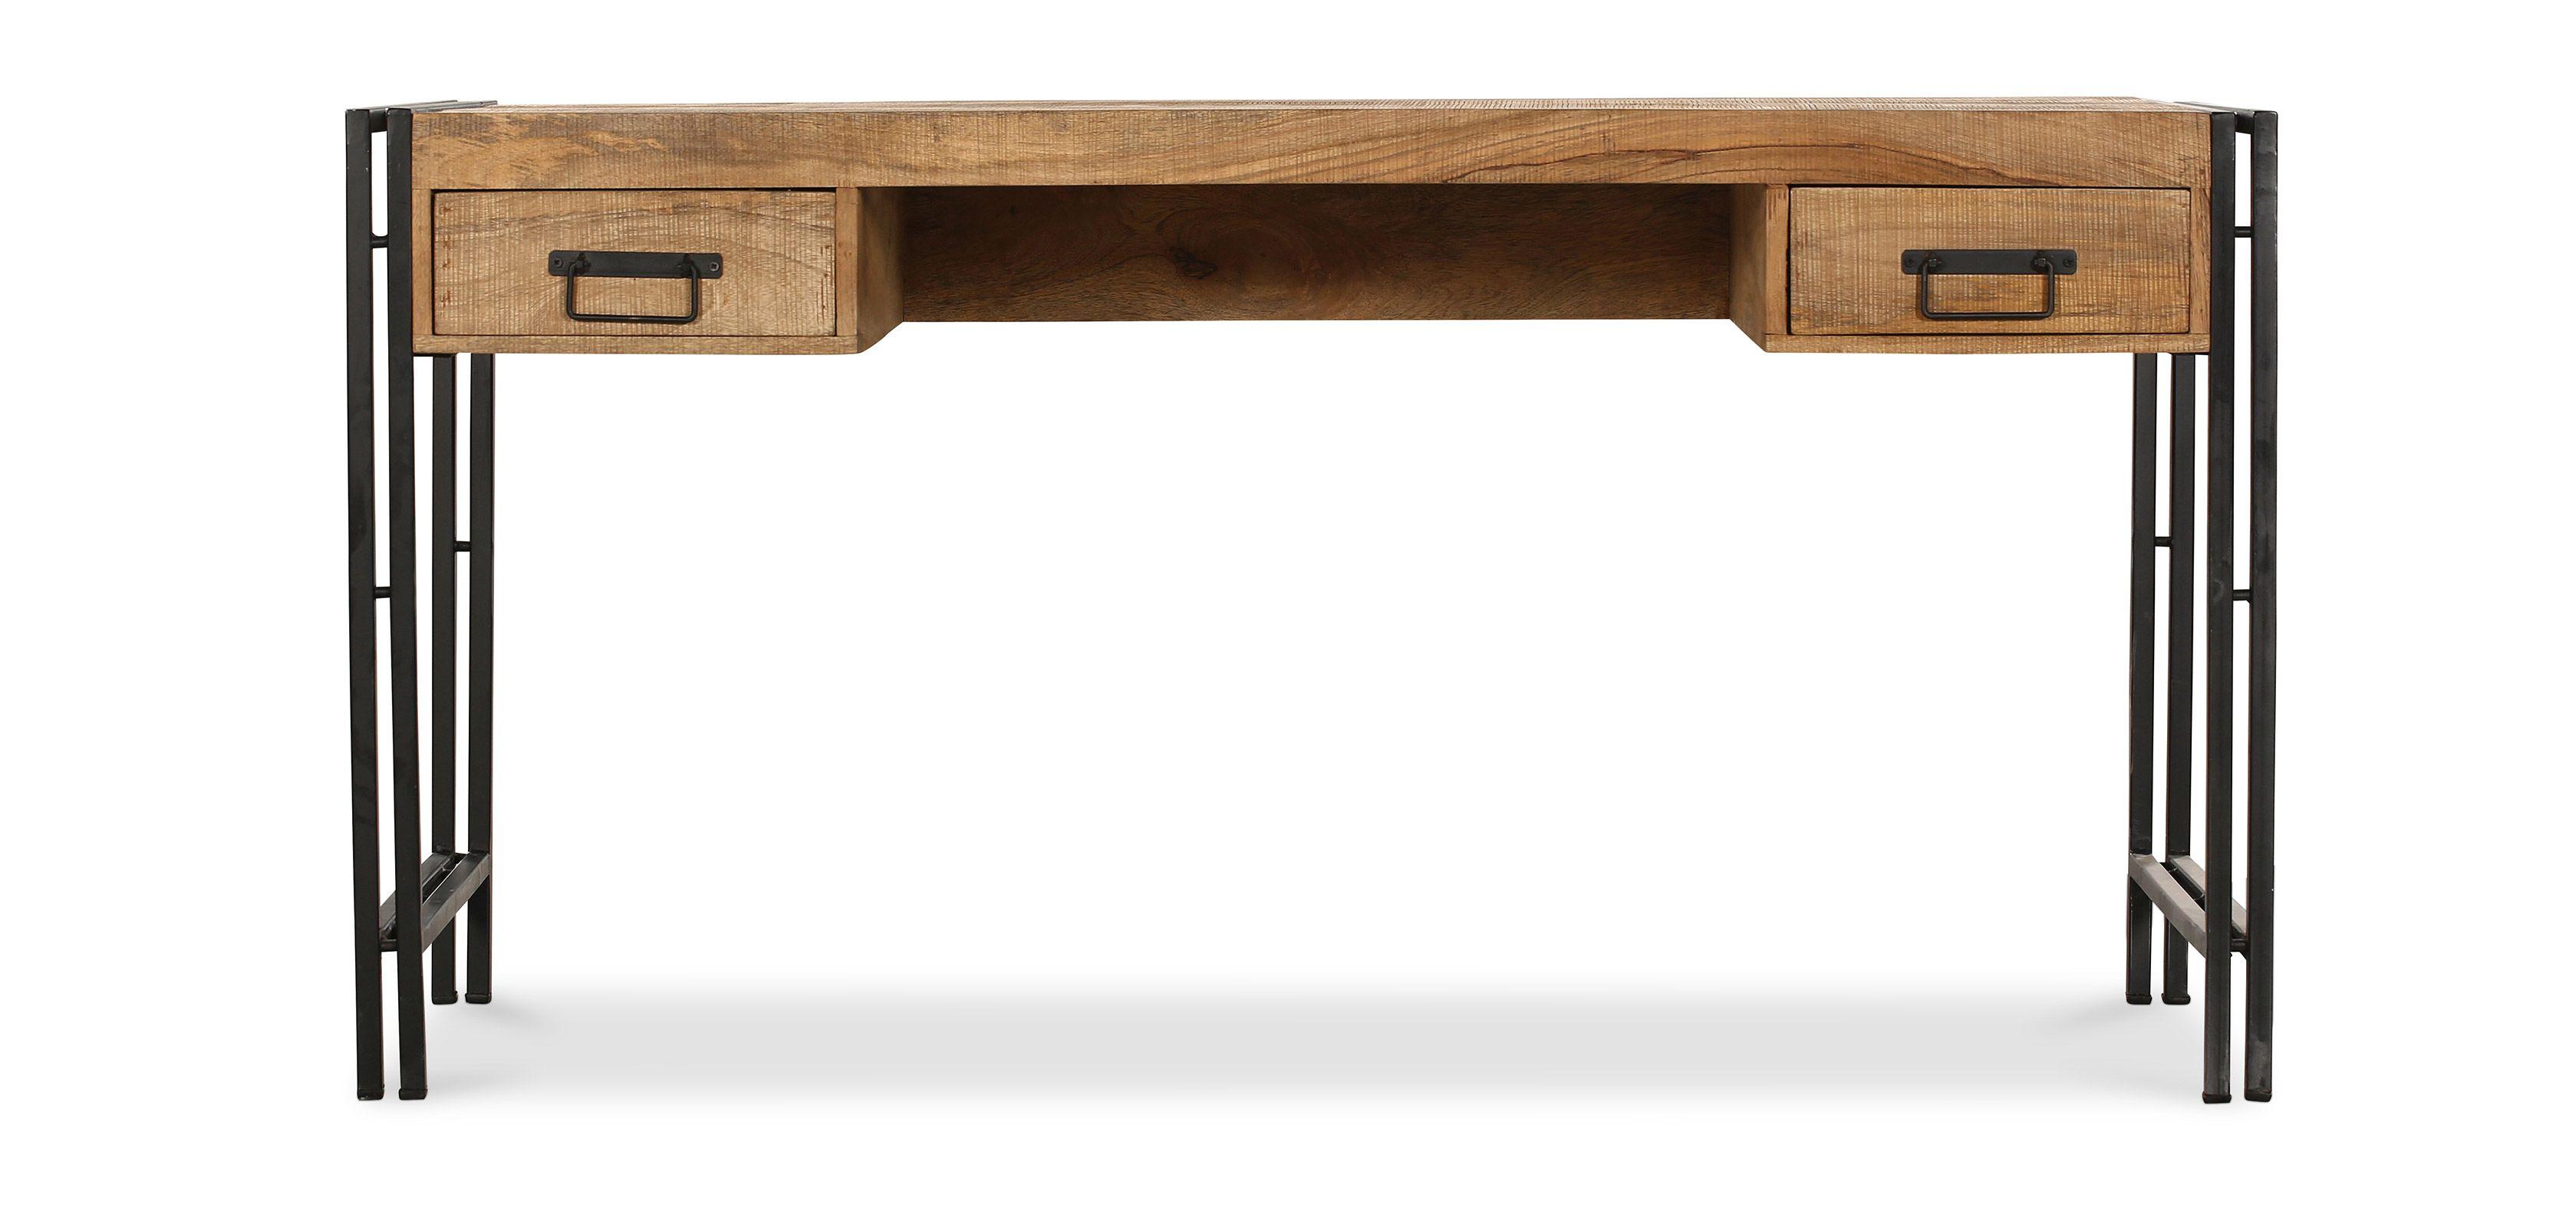 Bureau Metallique Industriel Vintage onawa bureau en bois style vintage industriel | bureau bois